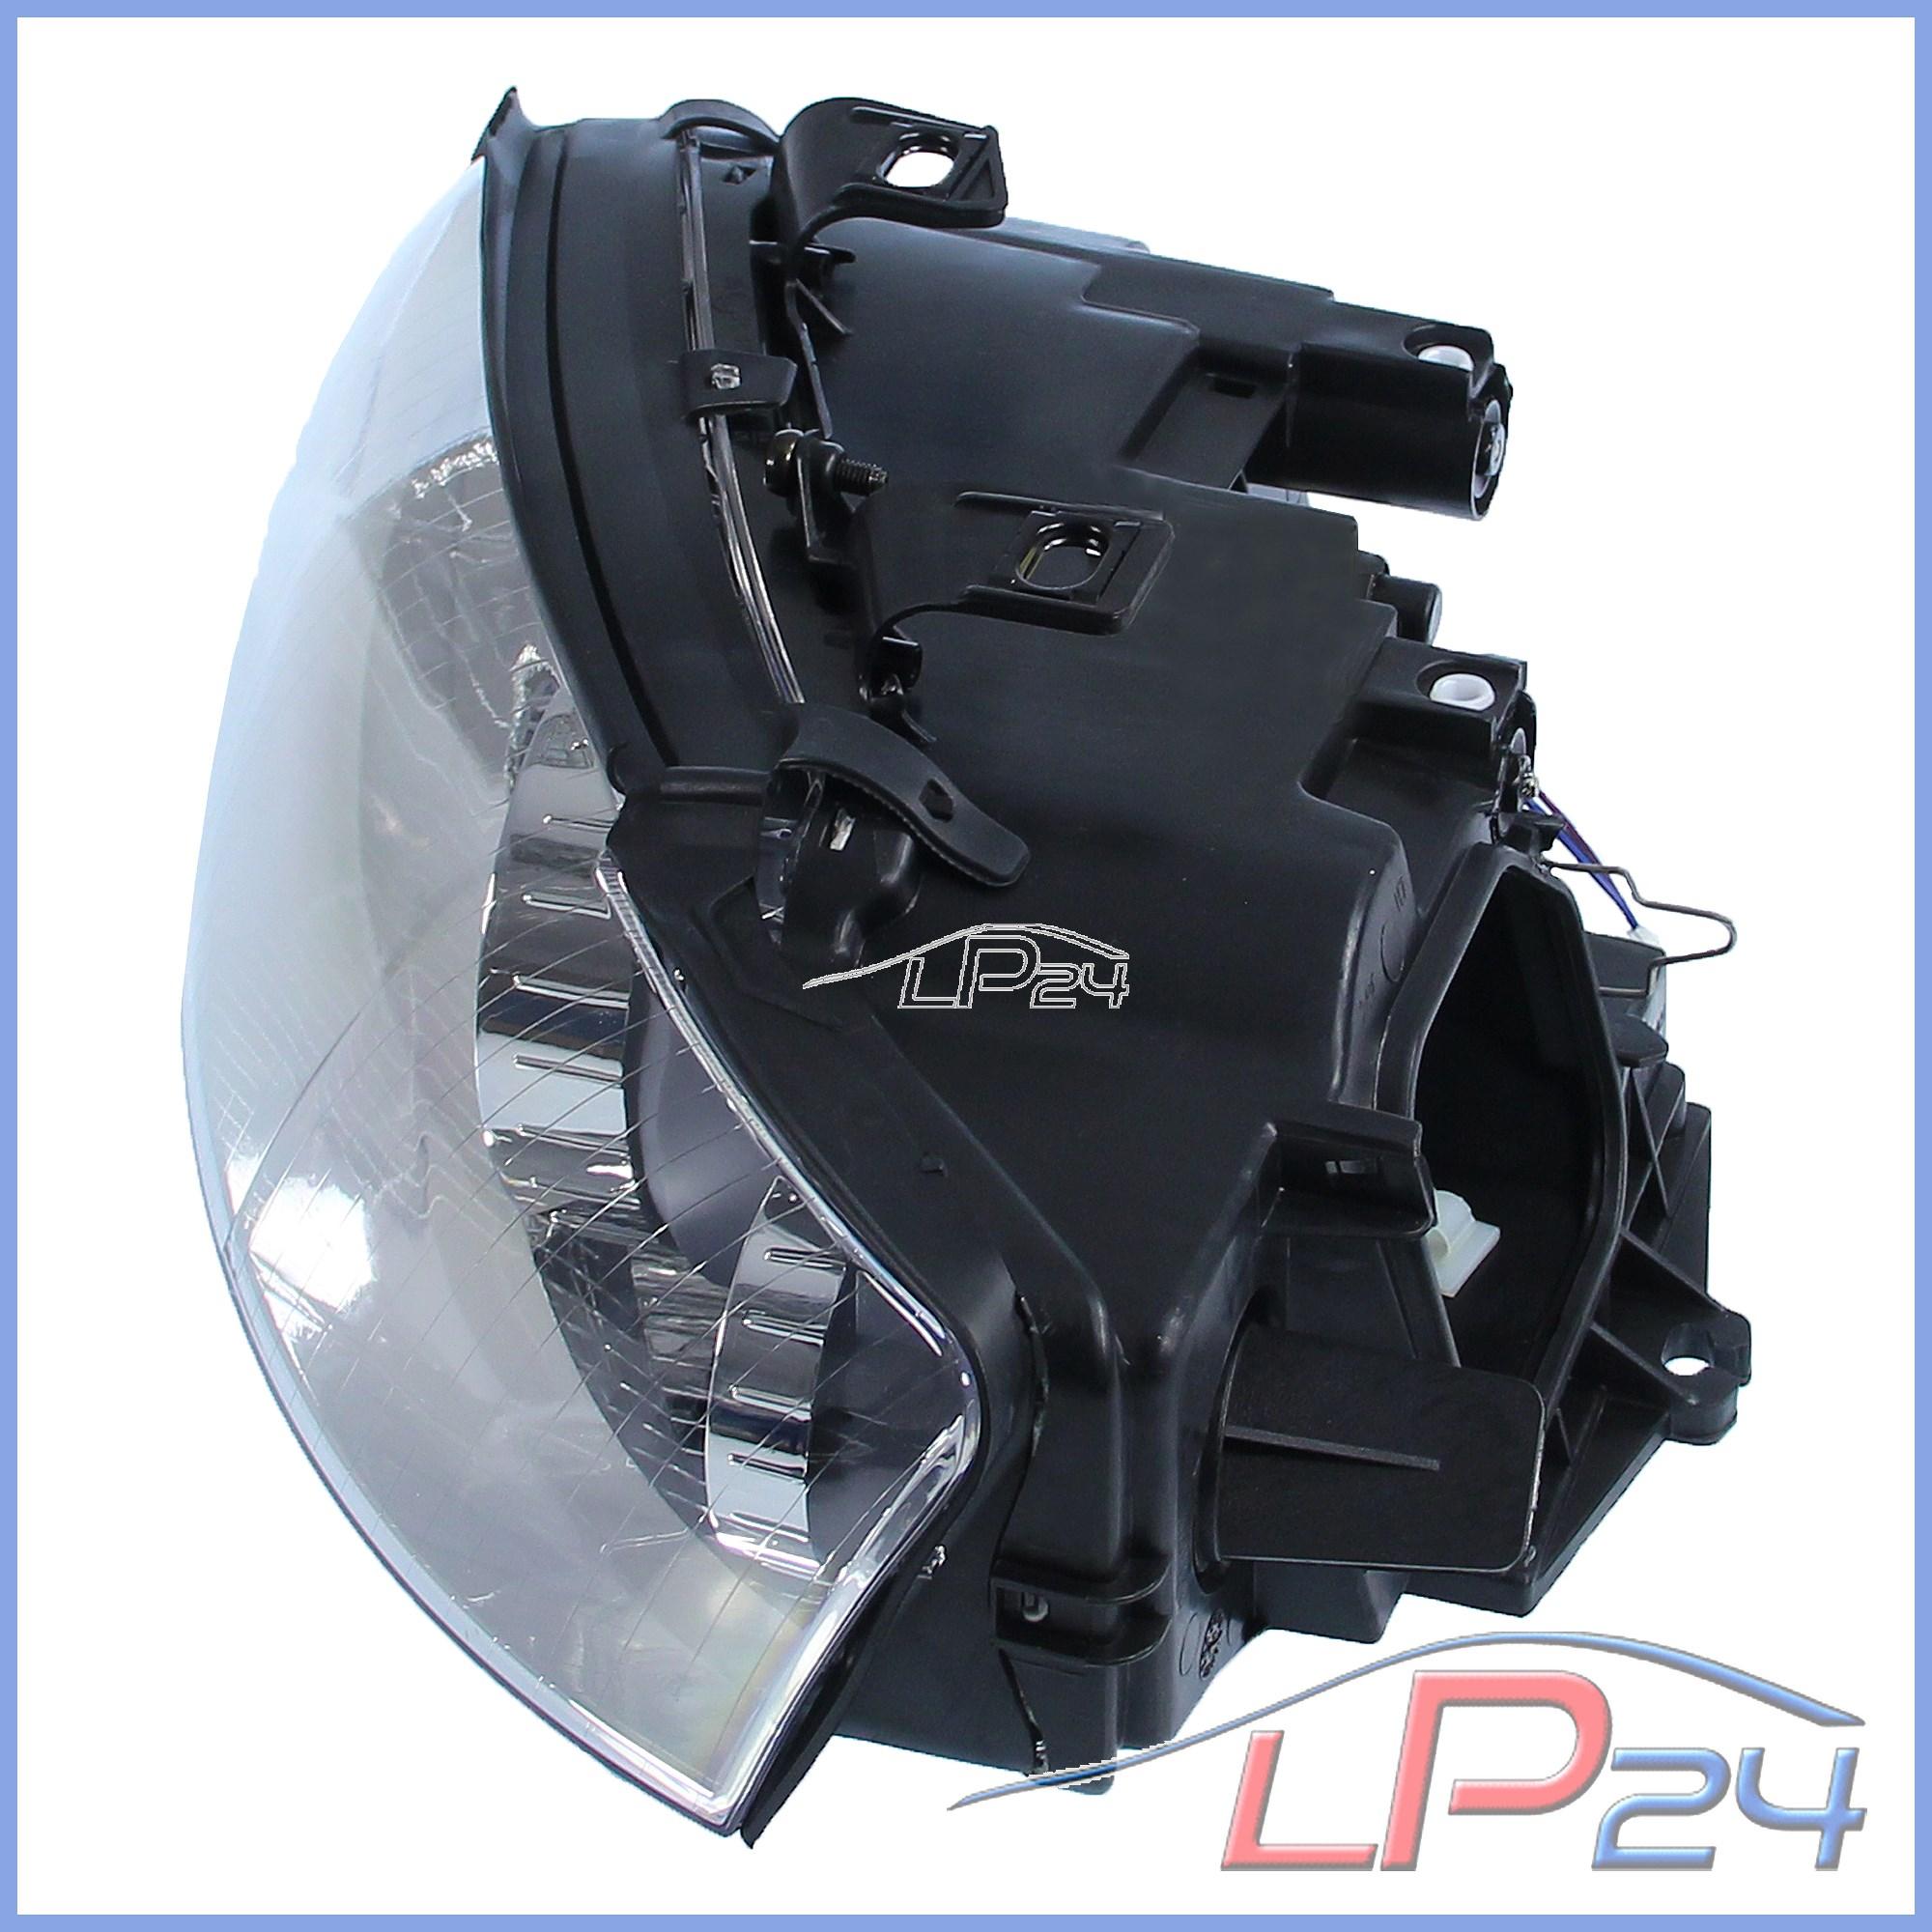 2x-PHARE-PRINCIPAL-H7-H7-AVANT-GAUCHE-DROIT-AUDI-A4-8E-B6-AVANT-BREAK-00-04 miniature 4